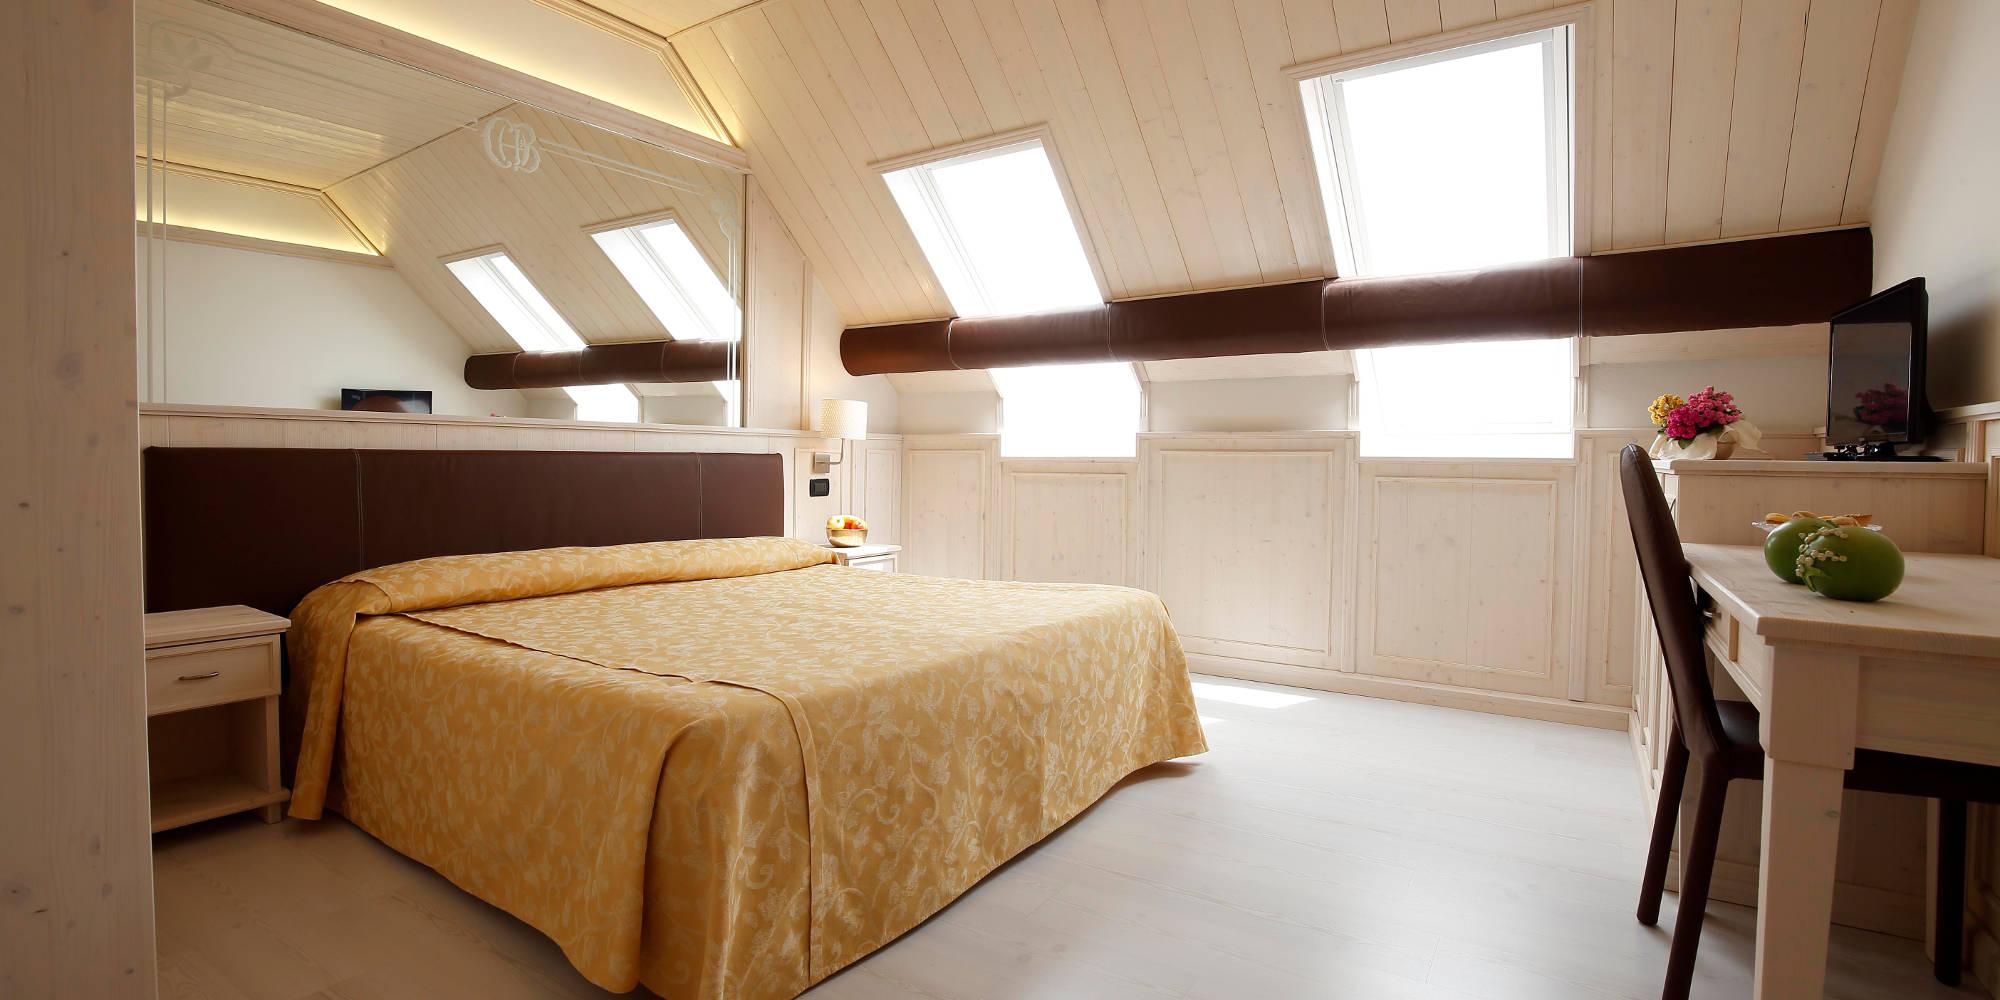 Camera da letto croce bianca hotel asiago asiagoneve - Camera da letto laccata bianca ...